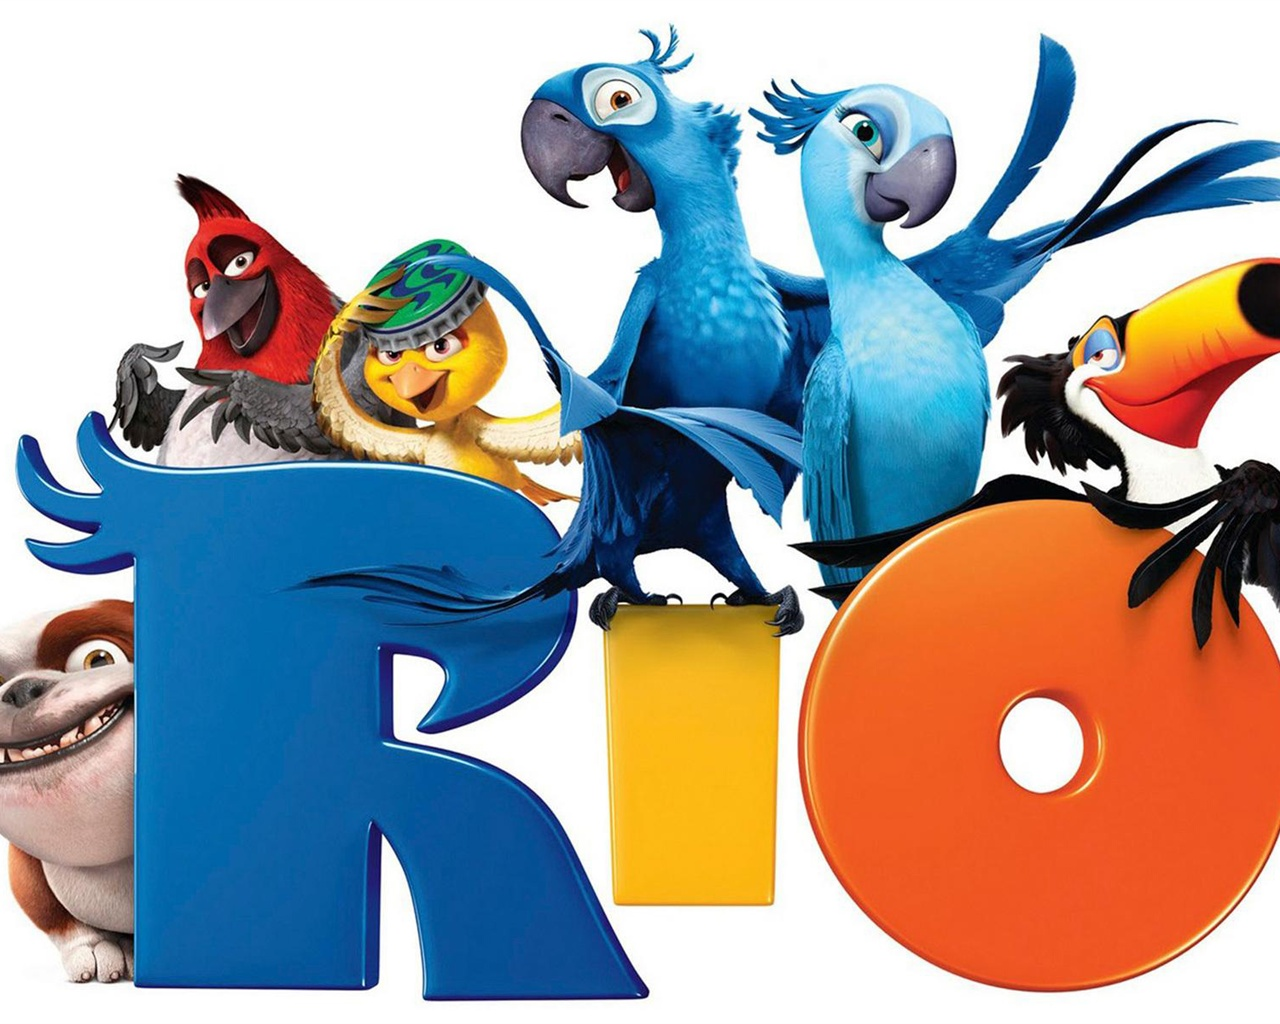 Rio Cartoon Movie Wallpaper 1280x1024 Resolution